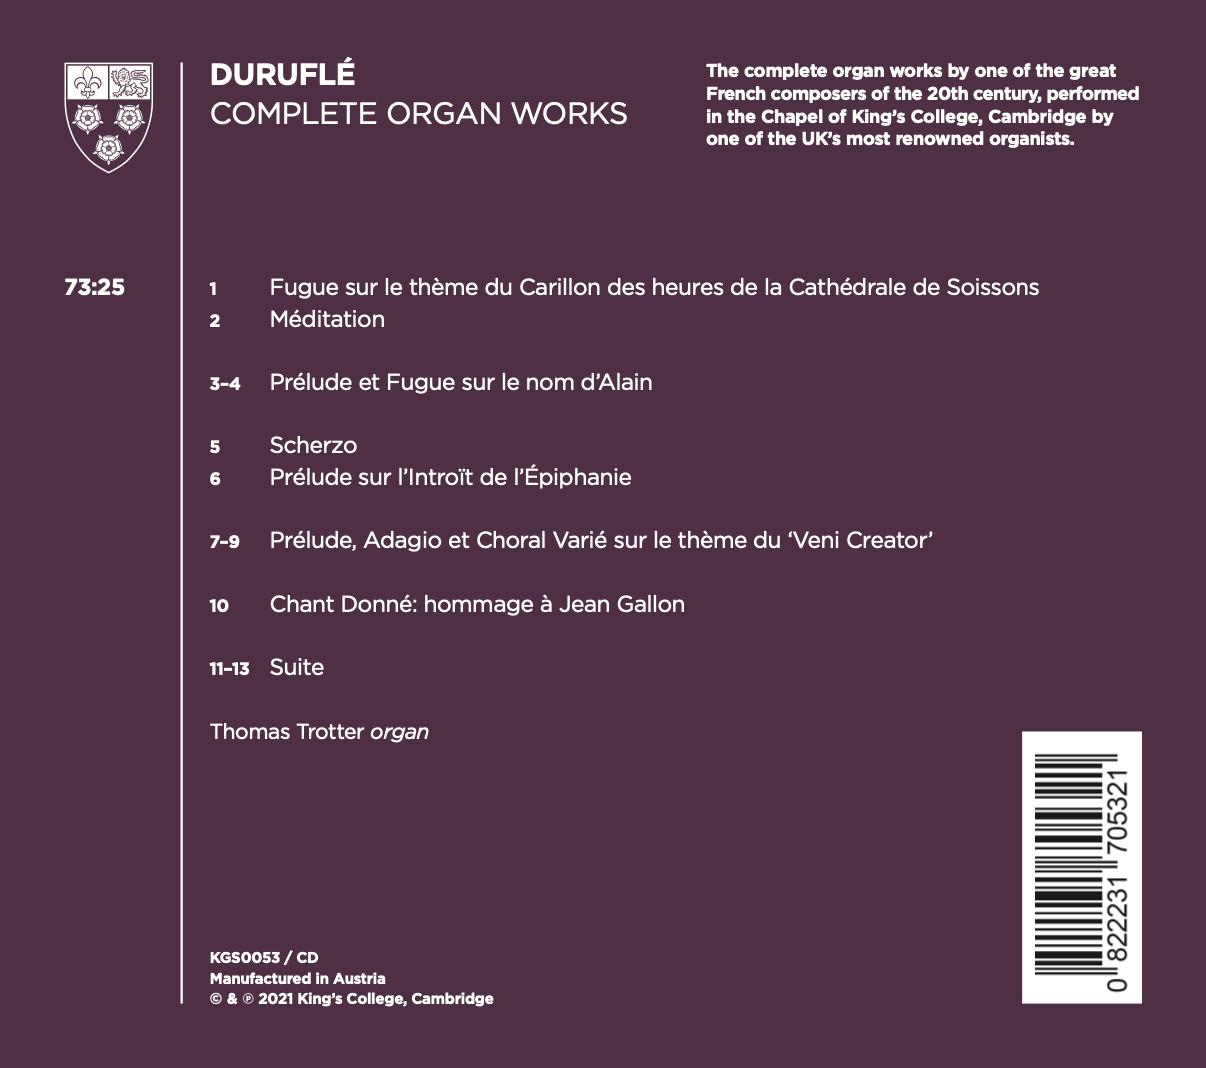 Thomas Trotter Duruflé back cover